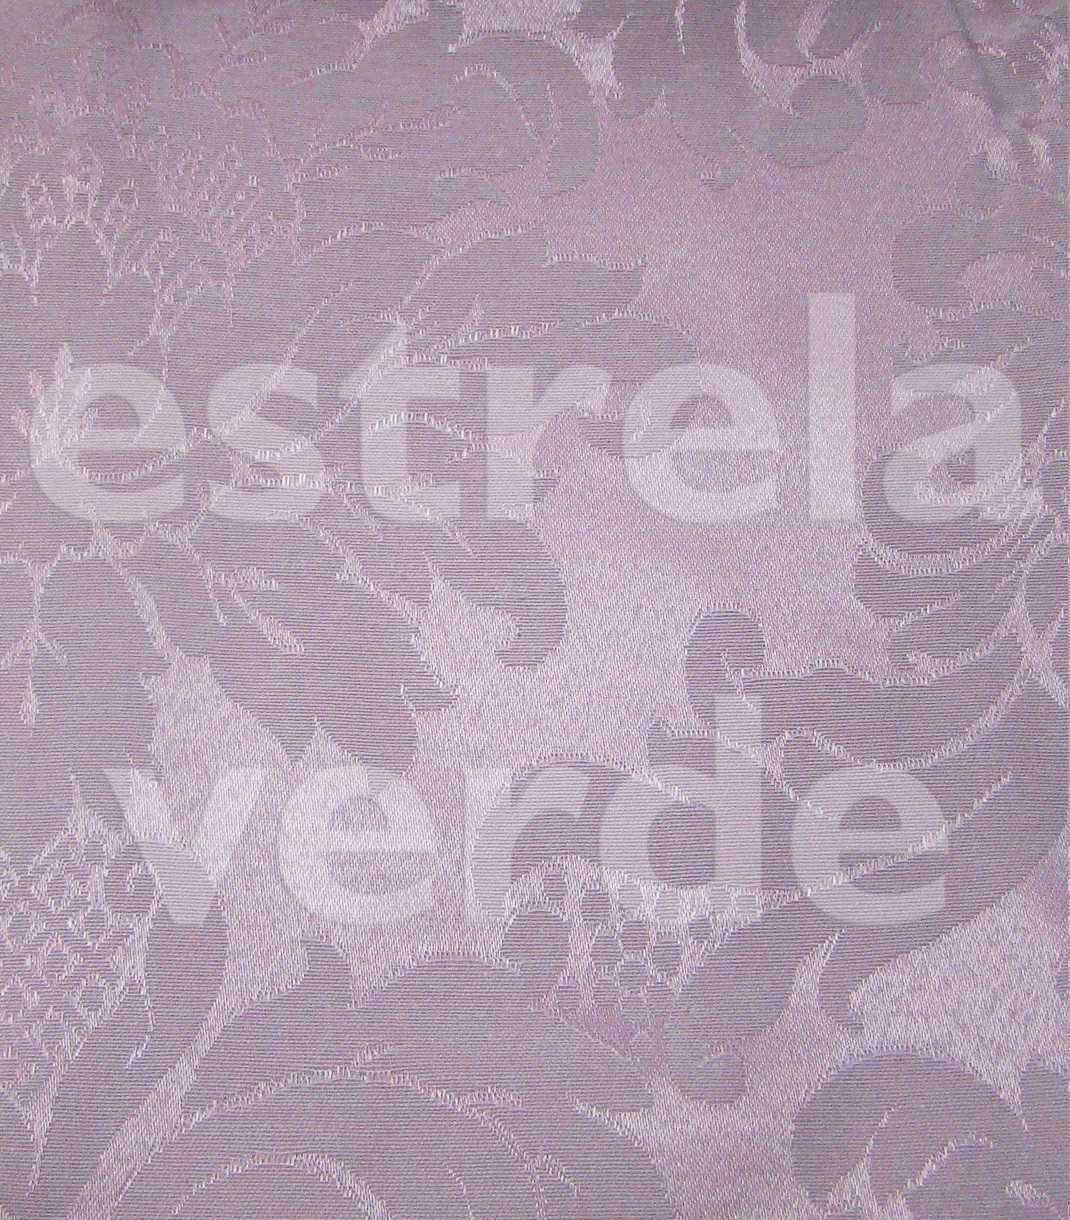 JACQUARD ROSA PASTEL (1139-135) 2,80 LARG DESCONTI  - Estrela Verde